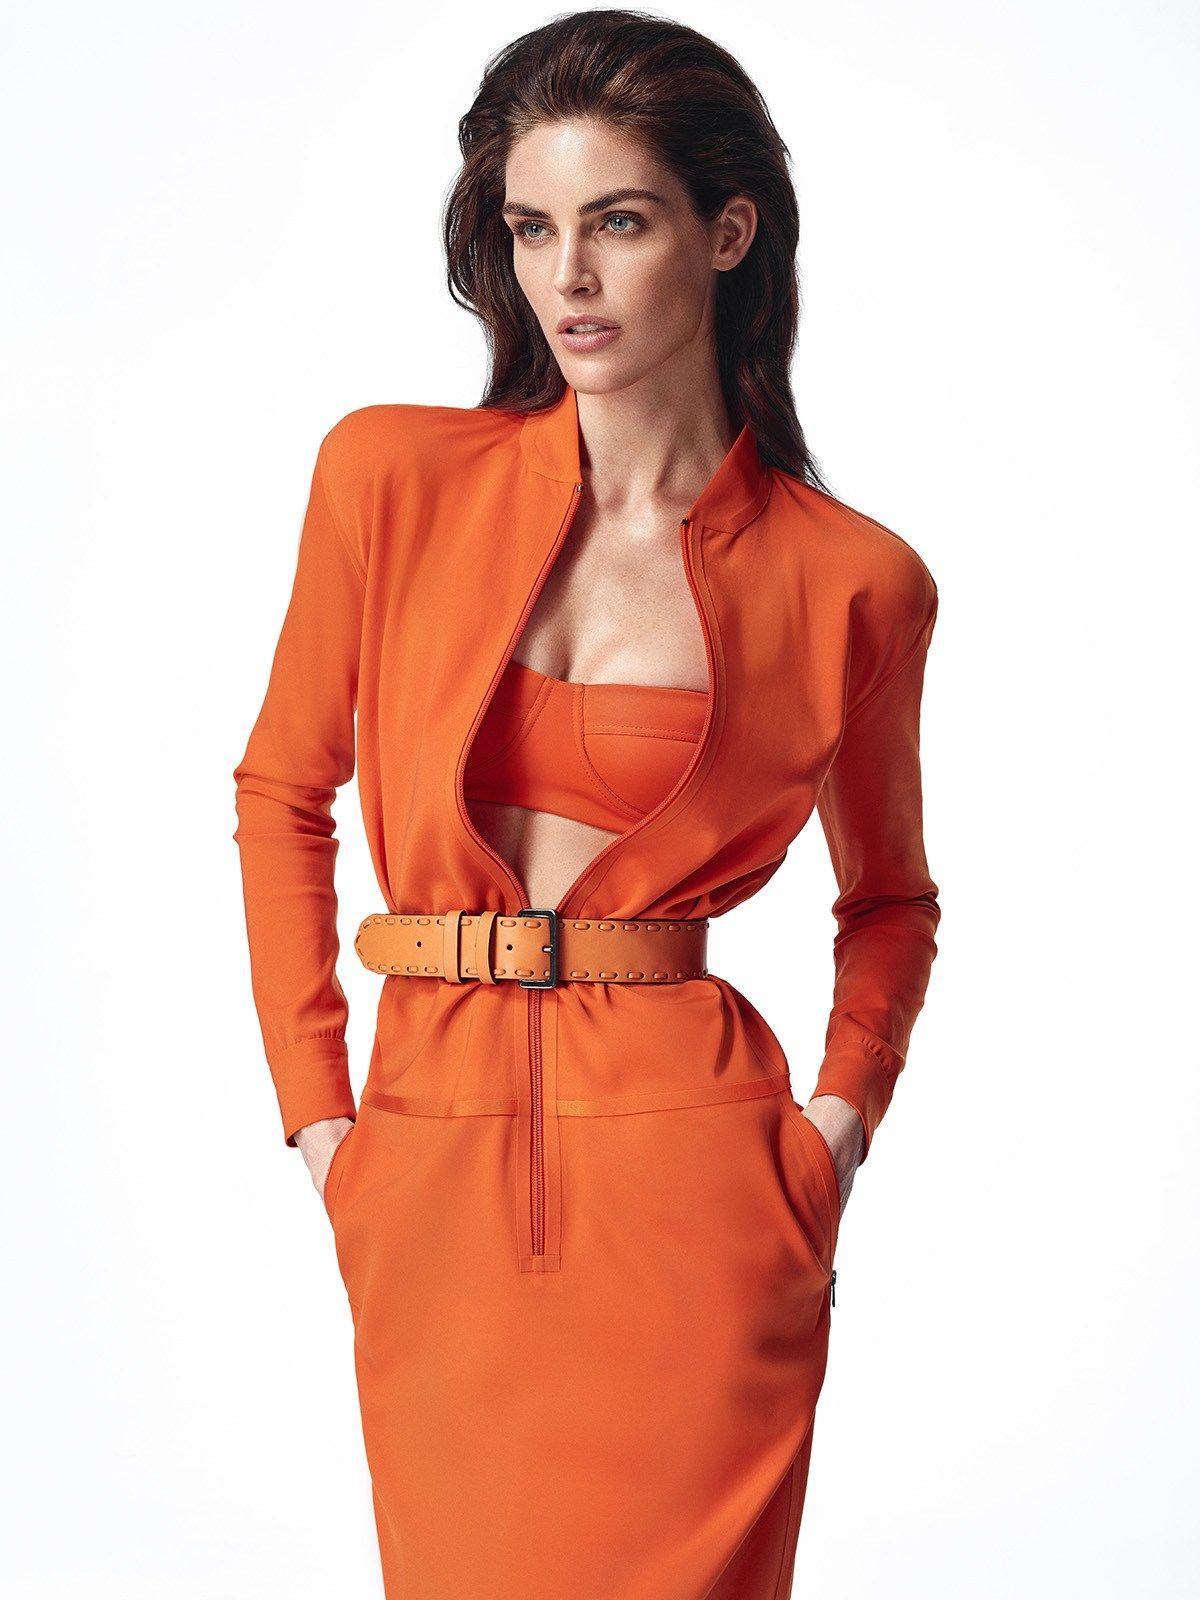 HILARY RHODA for Dress to Kill, Spring 2017